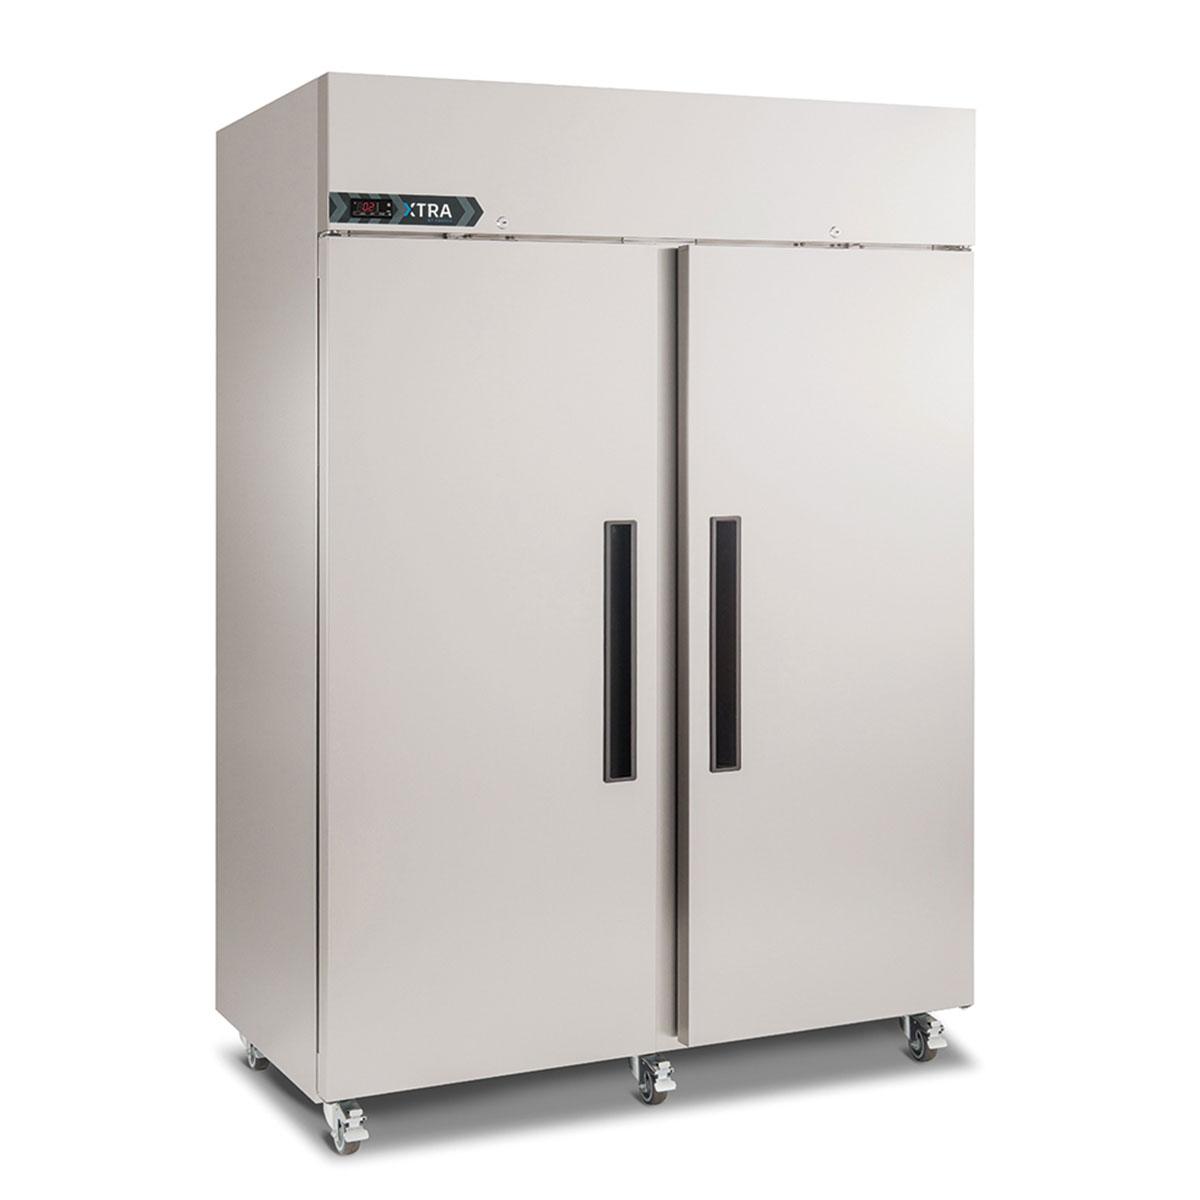 Foster xtra Double Door 1 - Refrigeration Equipment Suppliers in Cornwall